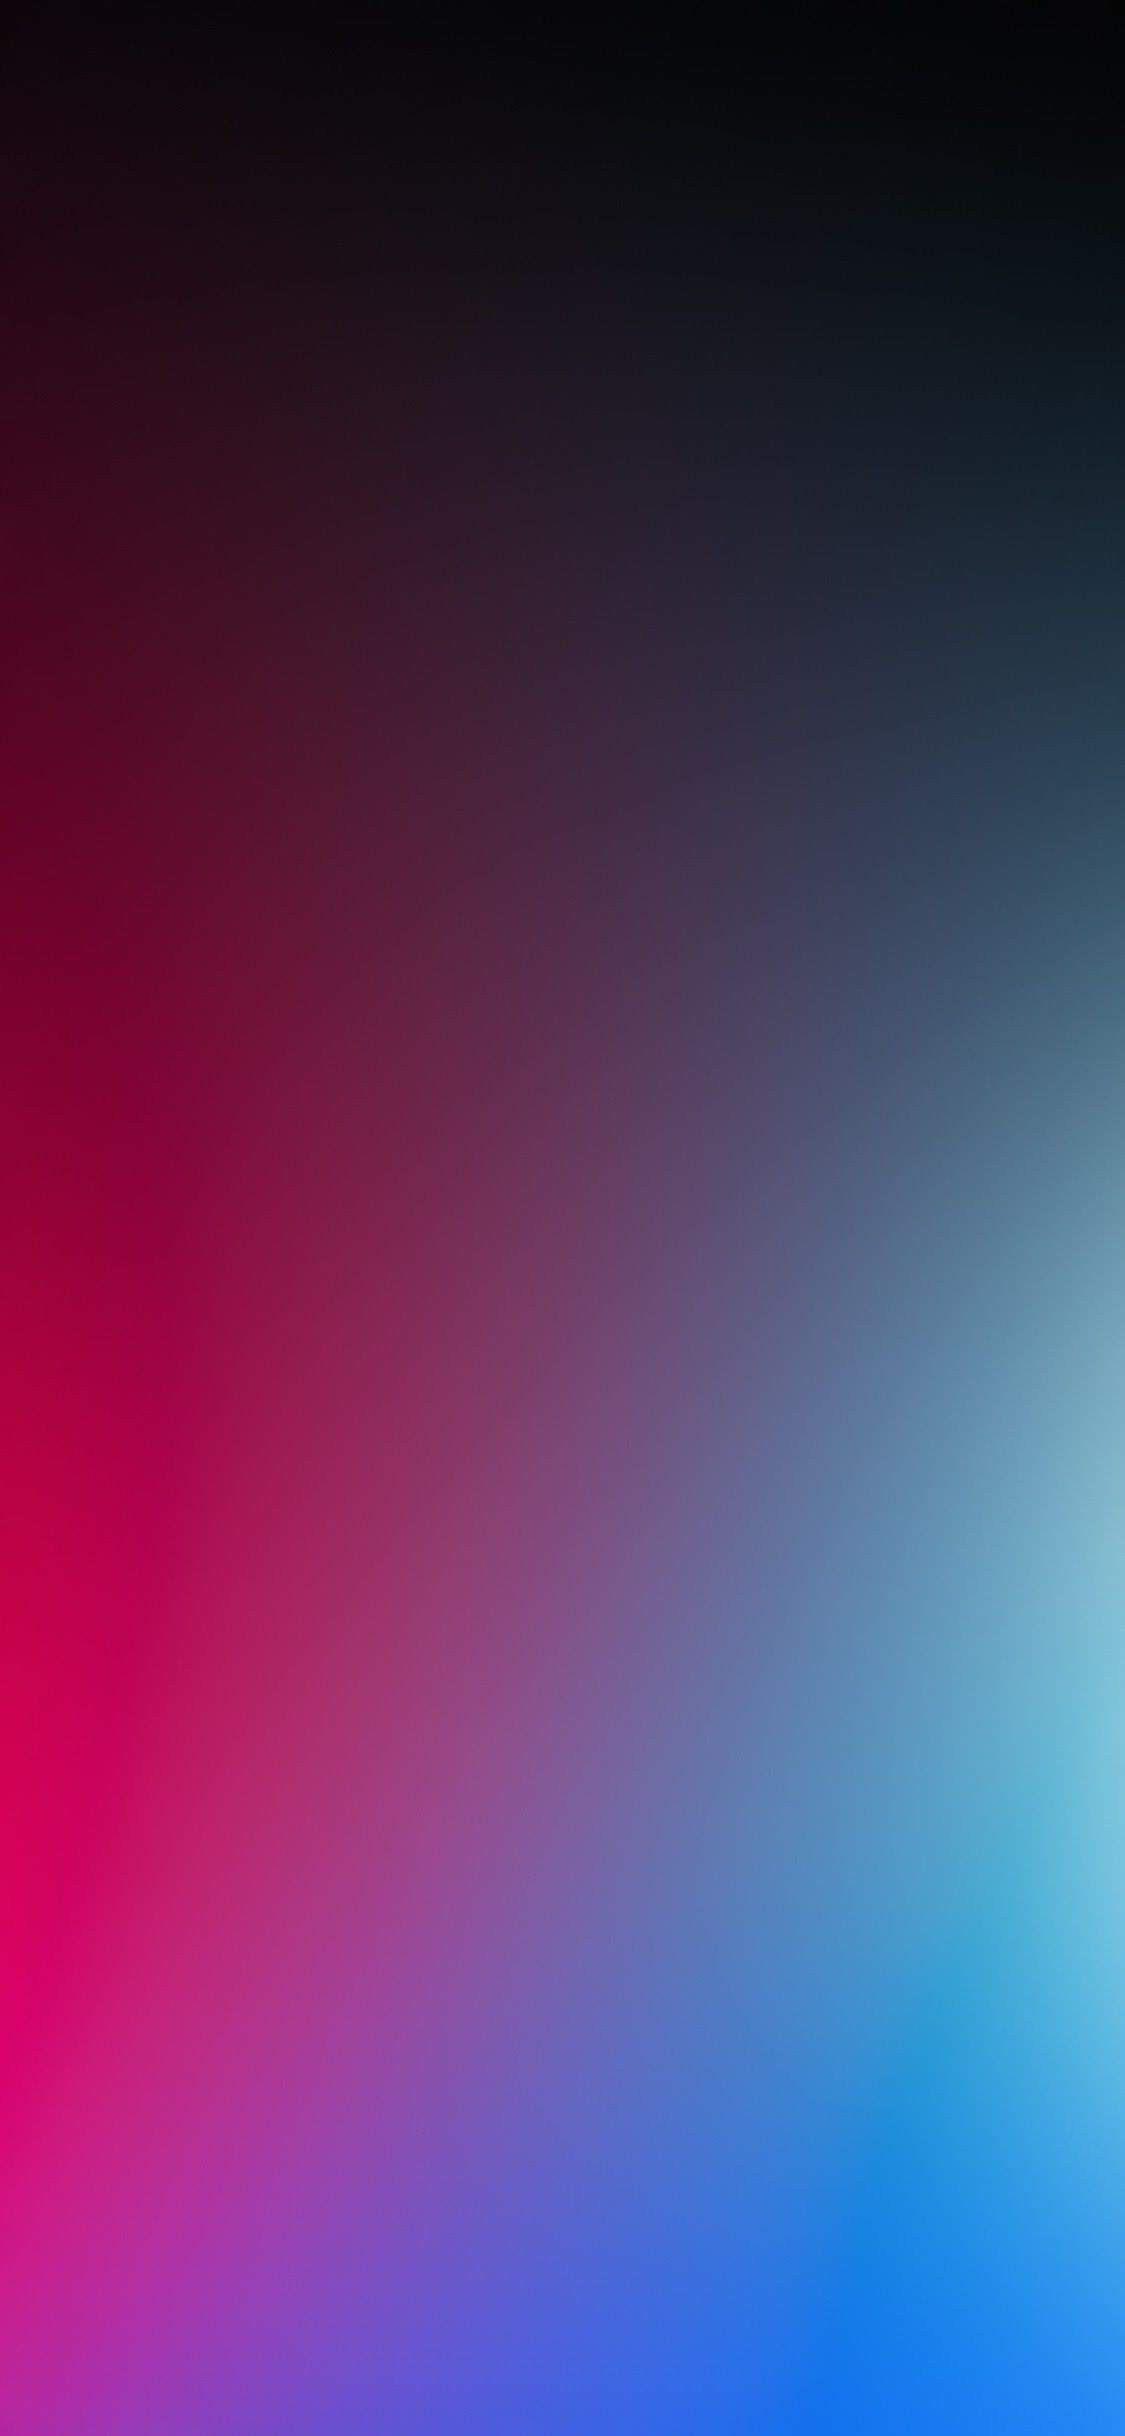 Pin By Ilian Oblashki On Wallpaper In 2020 Colorful Wallpaper